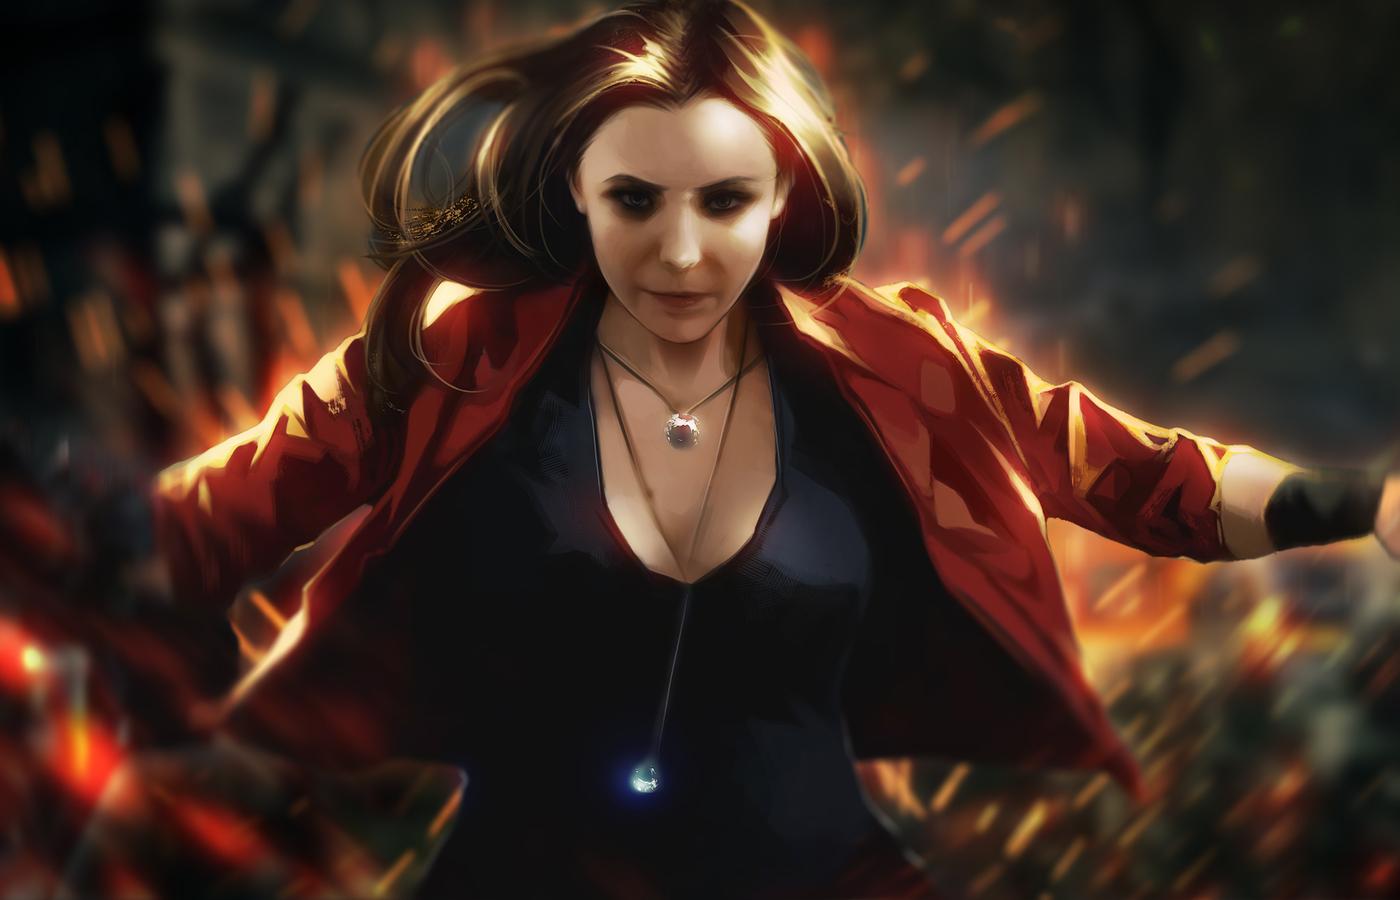 scarlet-witch-artwork-8d.jpg